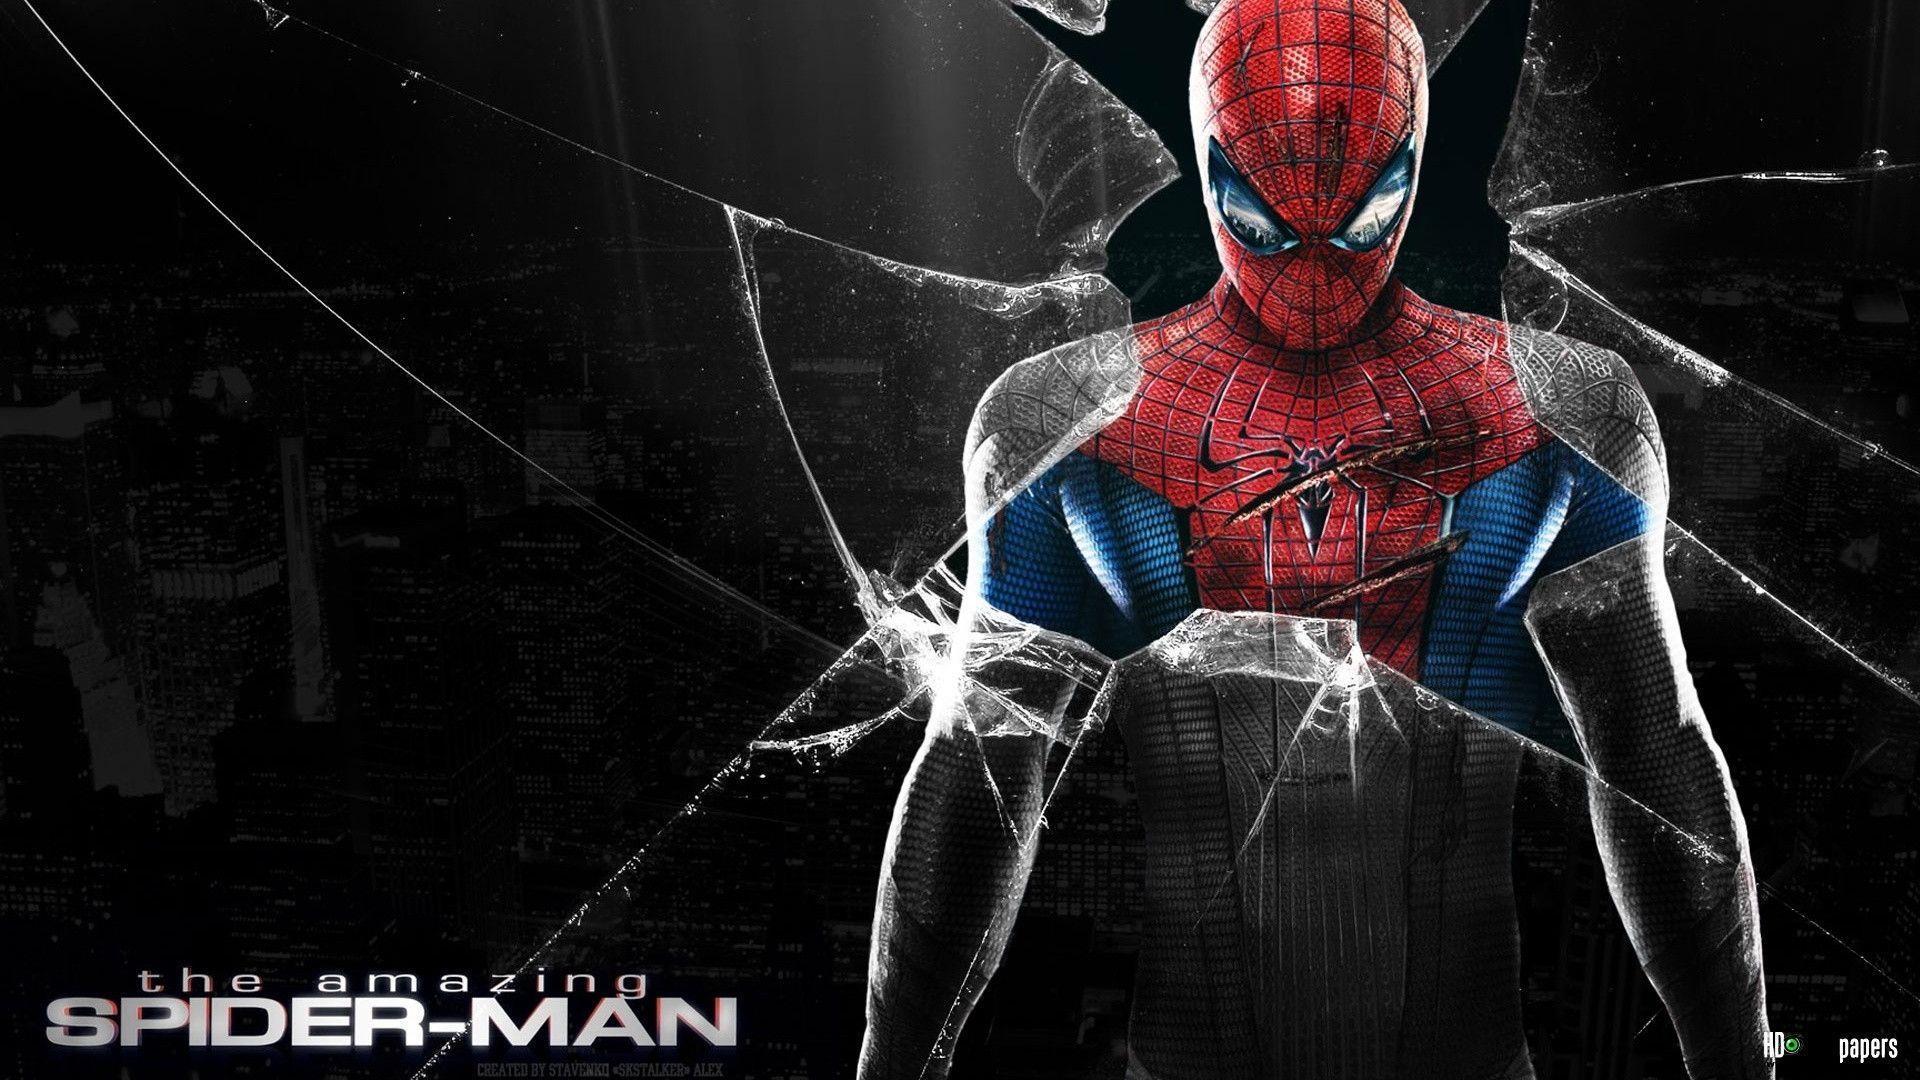 Black Spiderman Wallpaper For Laptop